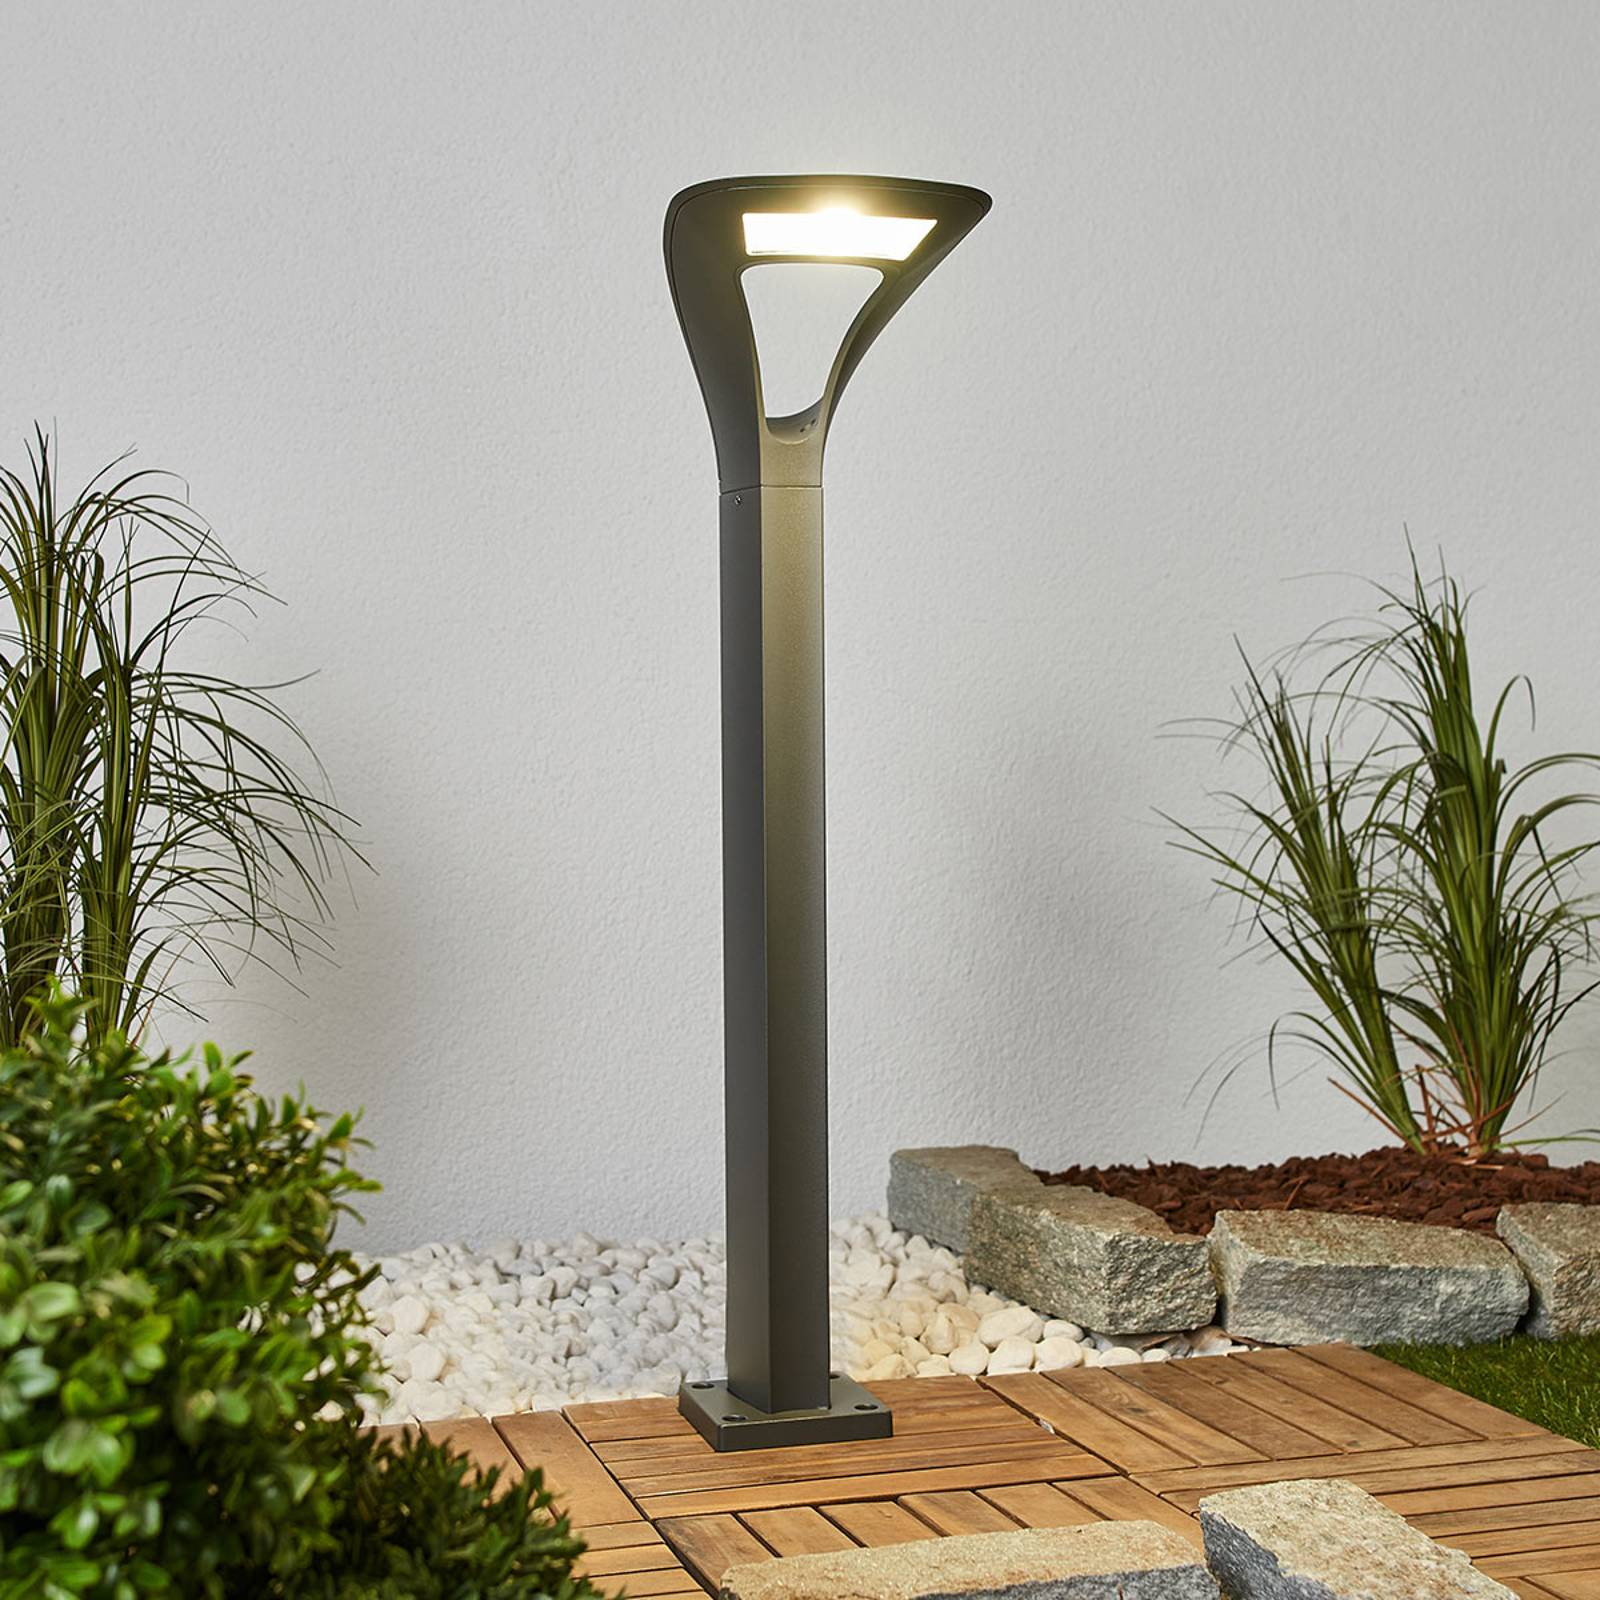 LED-Wegeleuchte Anda in interessanter Form